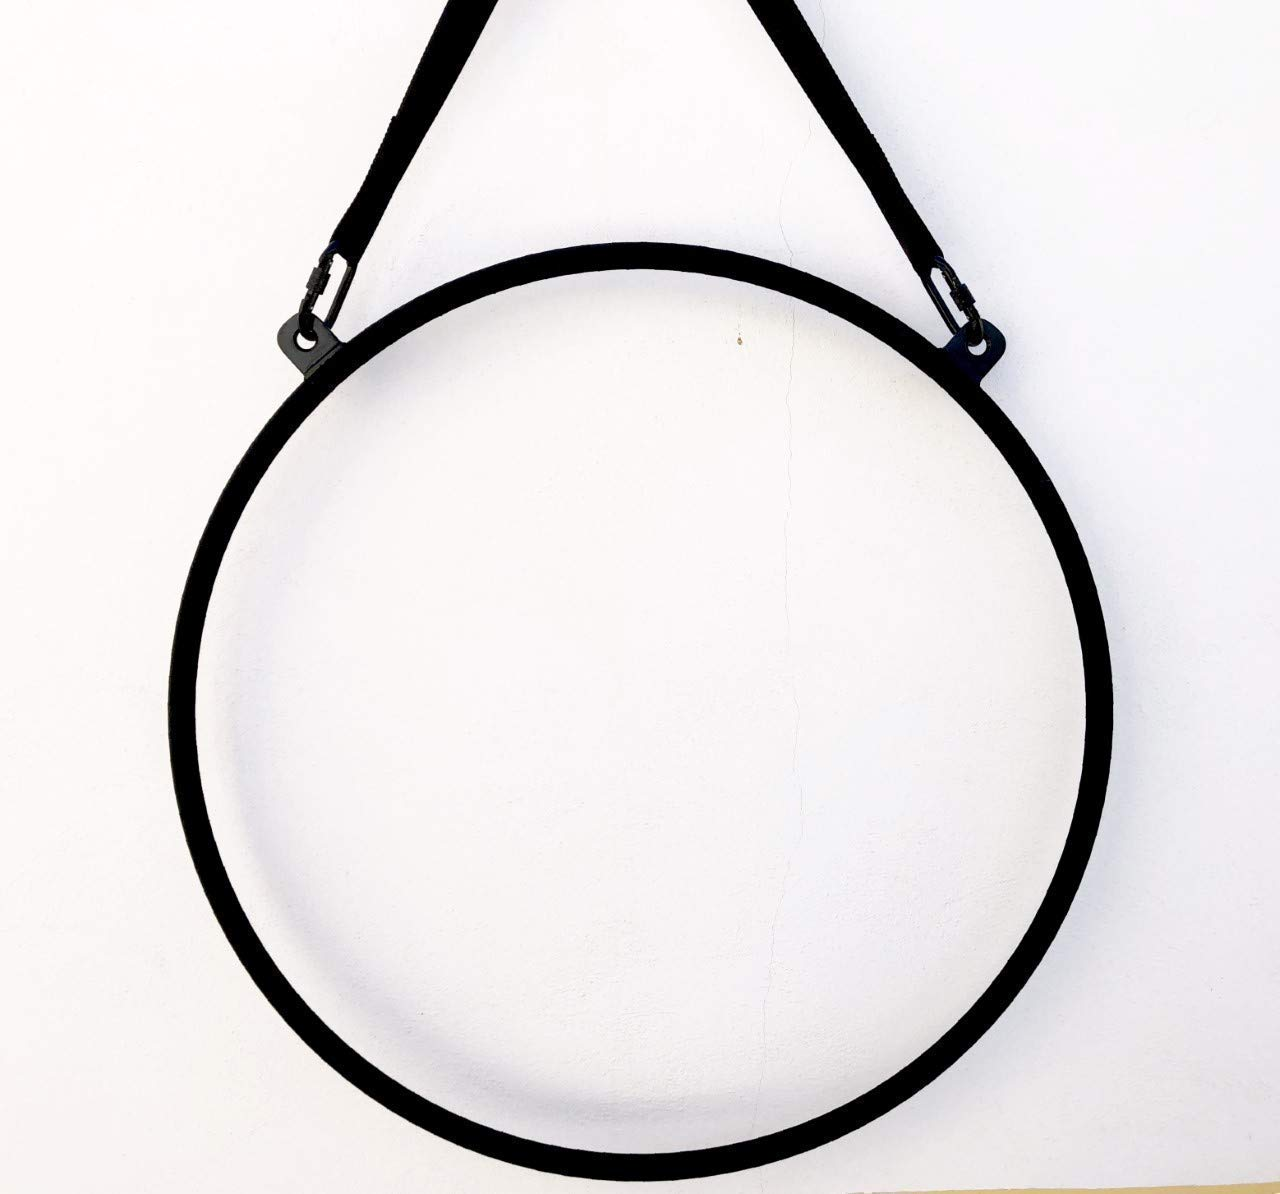 Aro aéreo acrobático,aerial hoop,lira para hacer acrobacias aéreas como en telas de yoga,pilates,para acróbatas de circo,lyra,trapecios,etc...